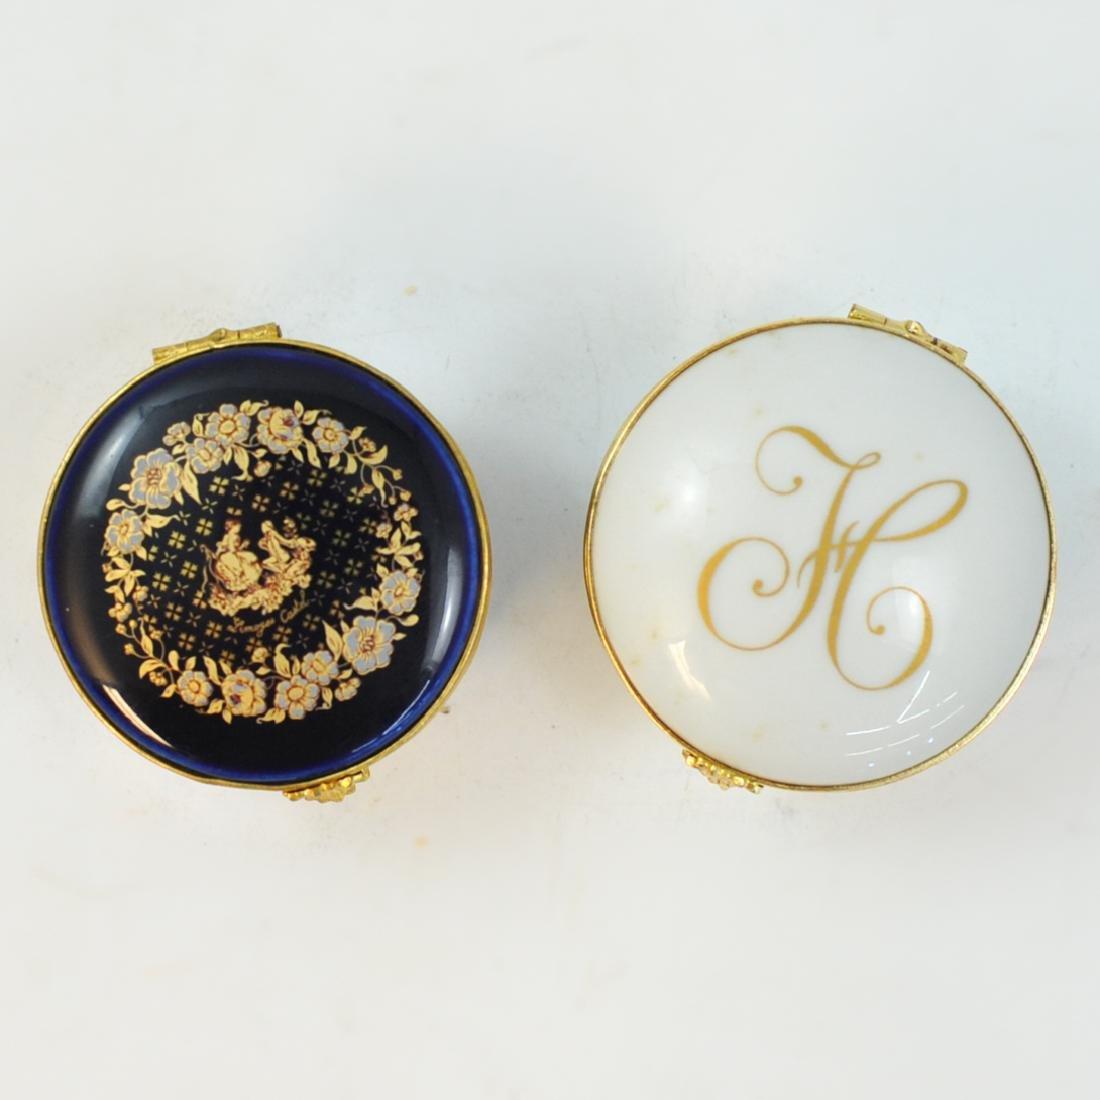 (2 Pc) Limoges Porcelain Round Boxes - 2